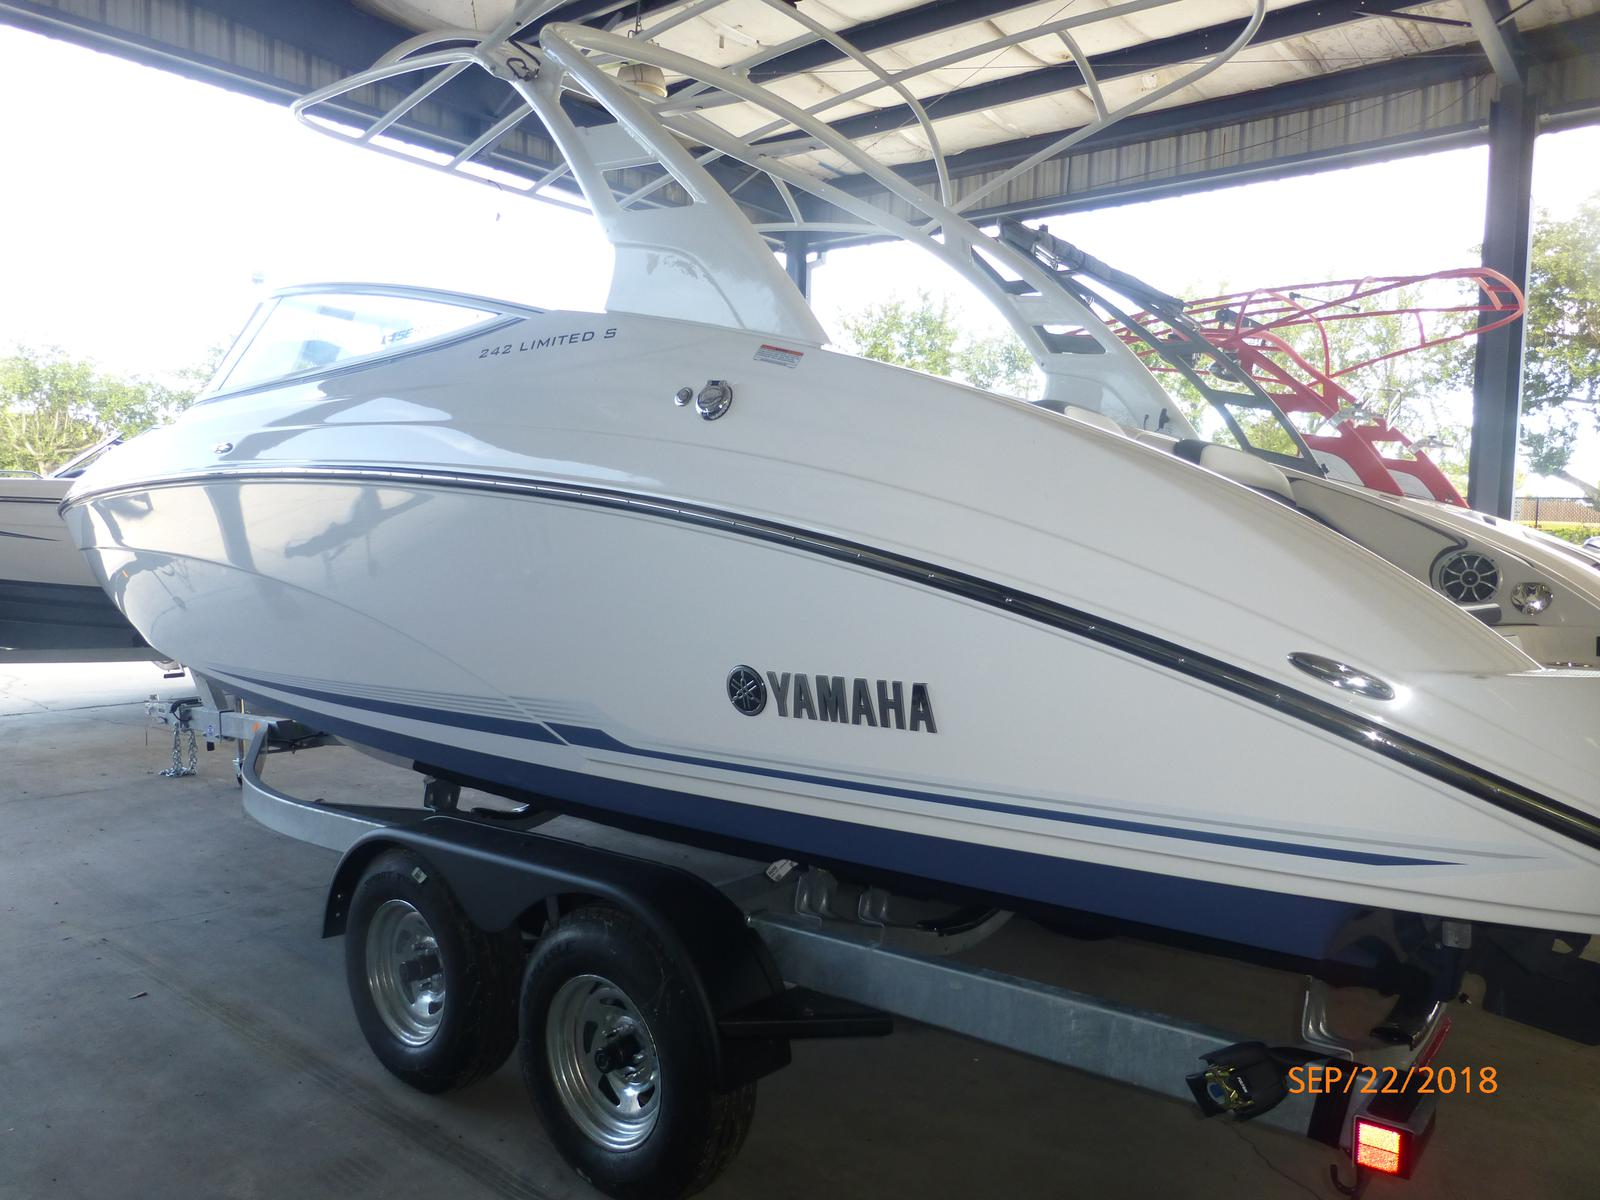 Yamaha 242 Limited S E-Series